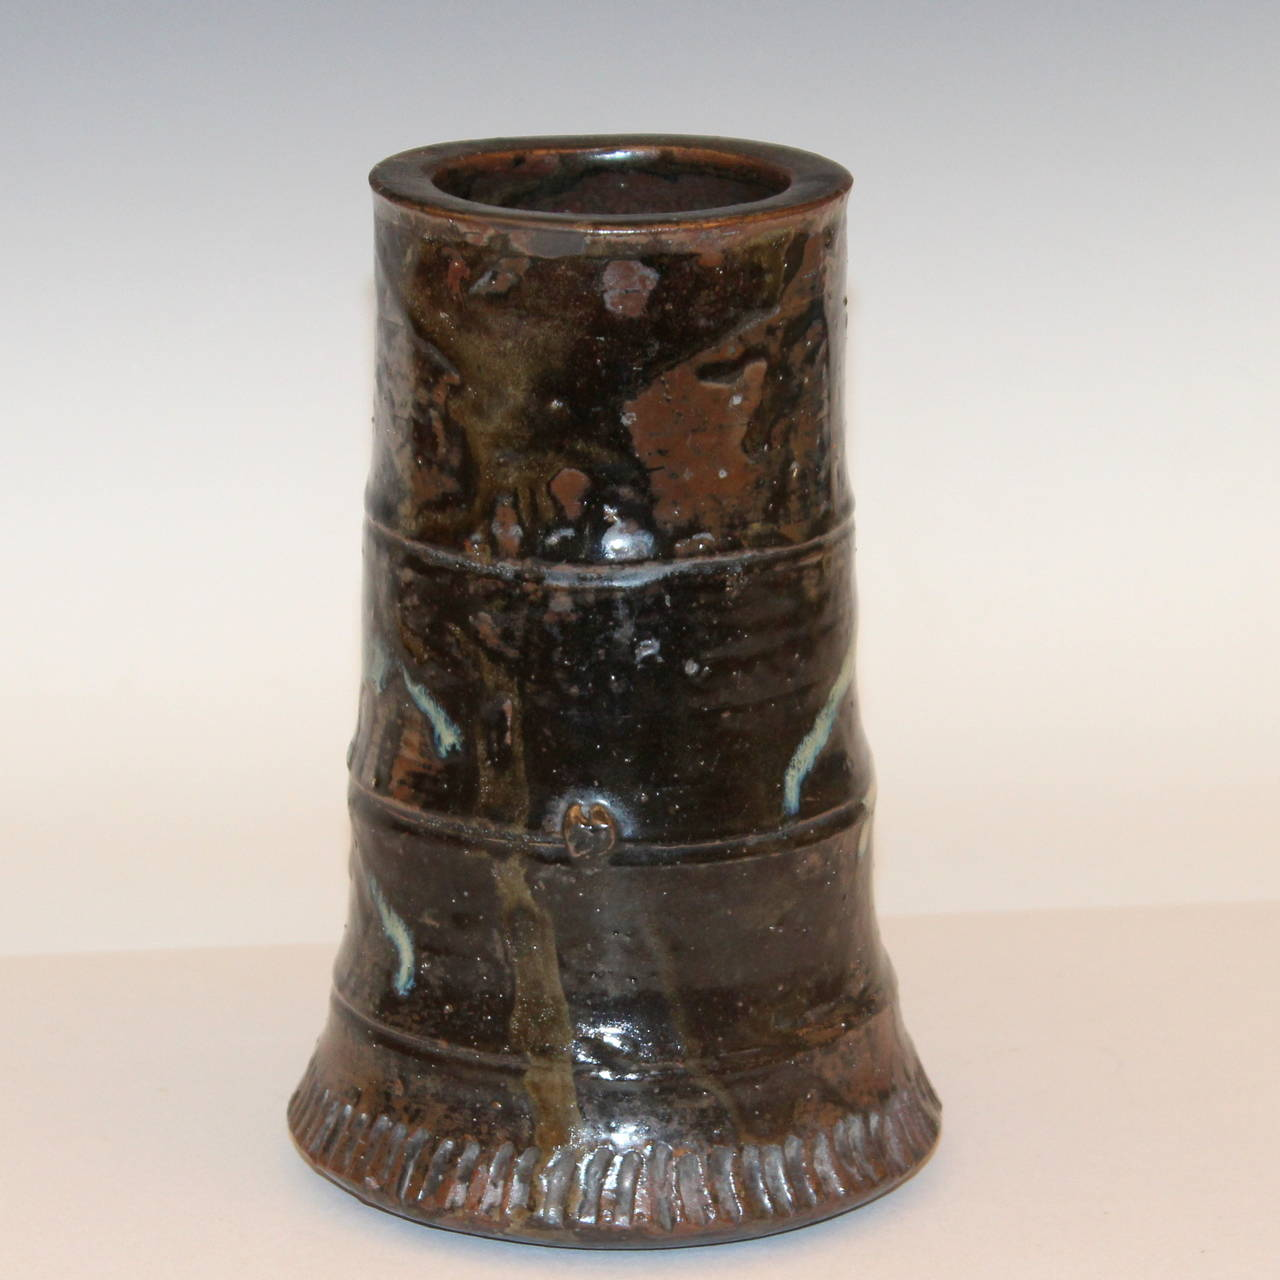 Antique Japanese Studio Pottery Tea Ceremony Ikebana Vase For Sale At 1stdibs